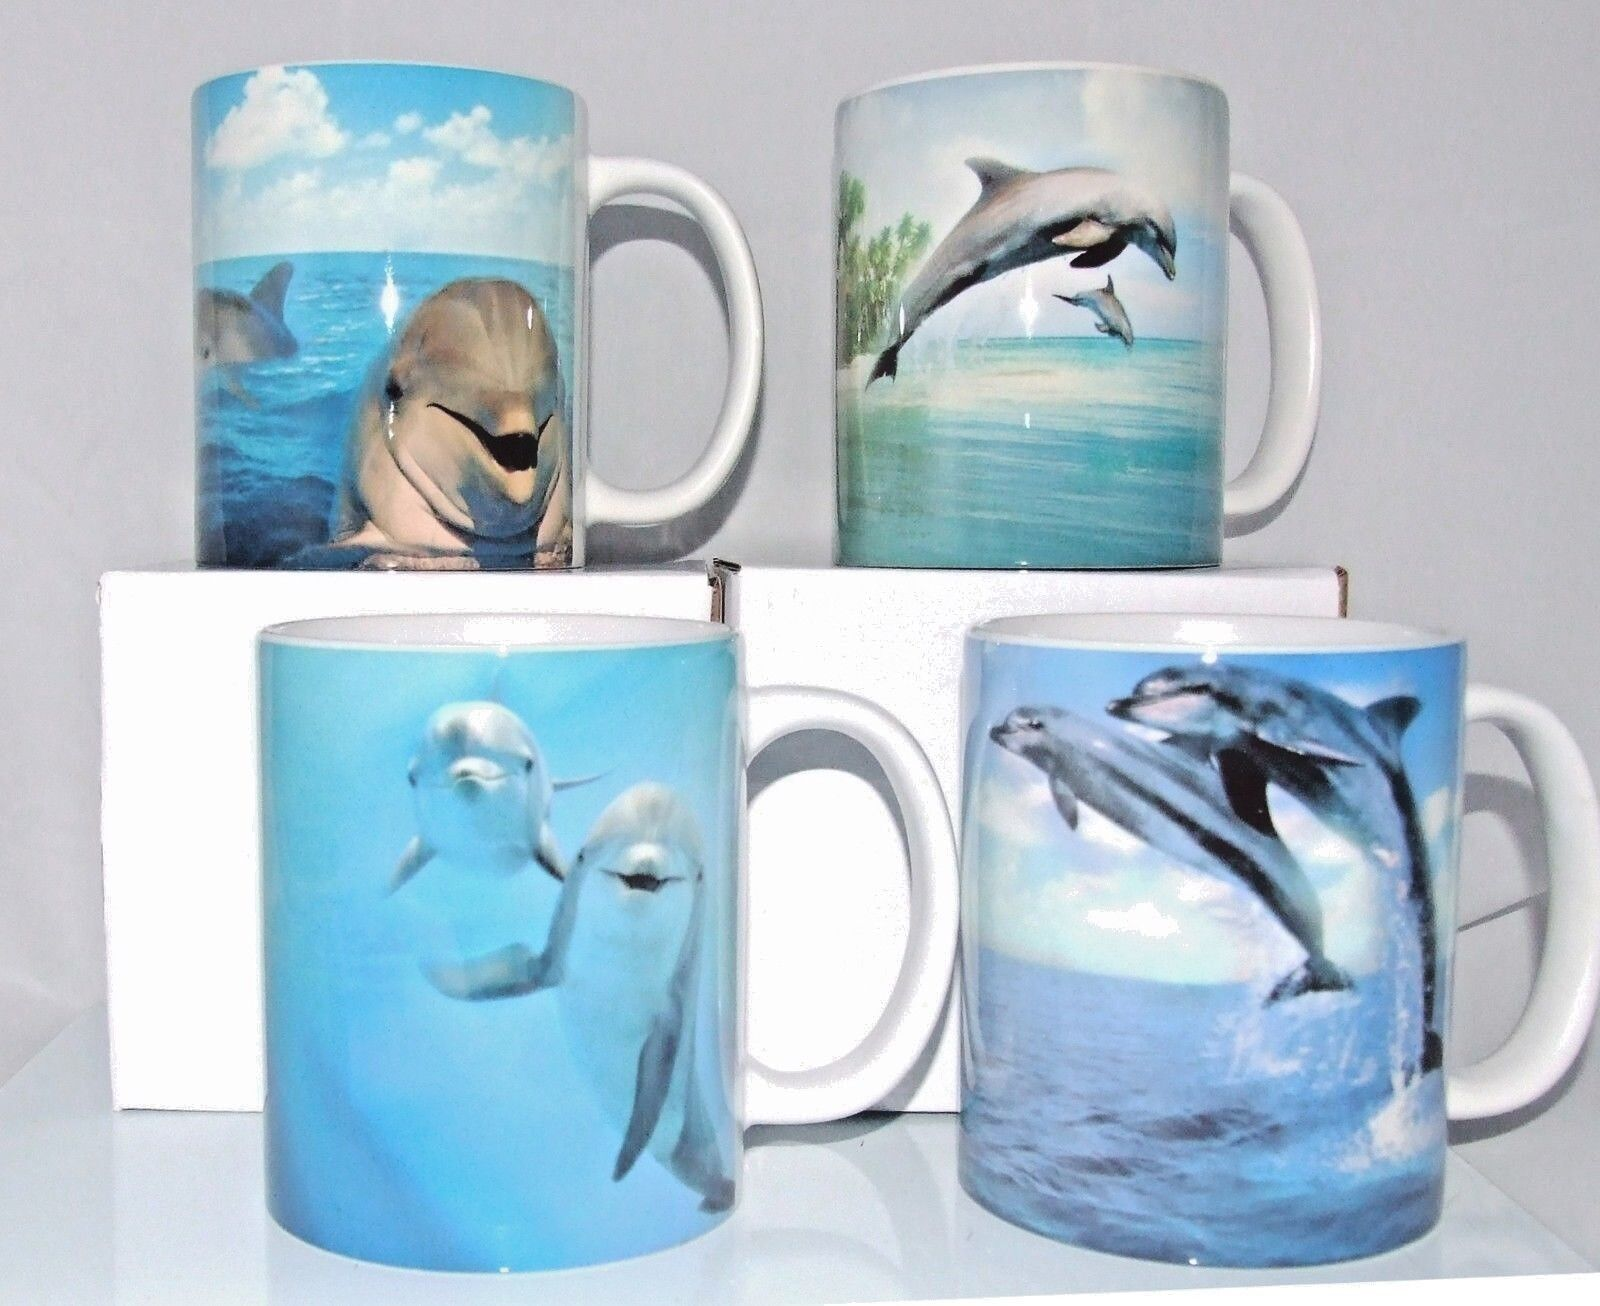 DOLPHIN PERSONALISED GIFT MUG with own text cool mugs coffee mug birthday